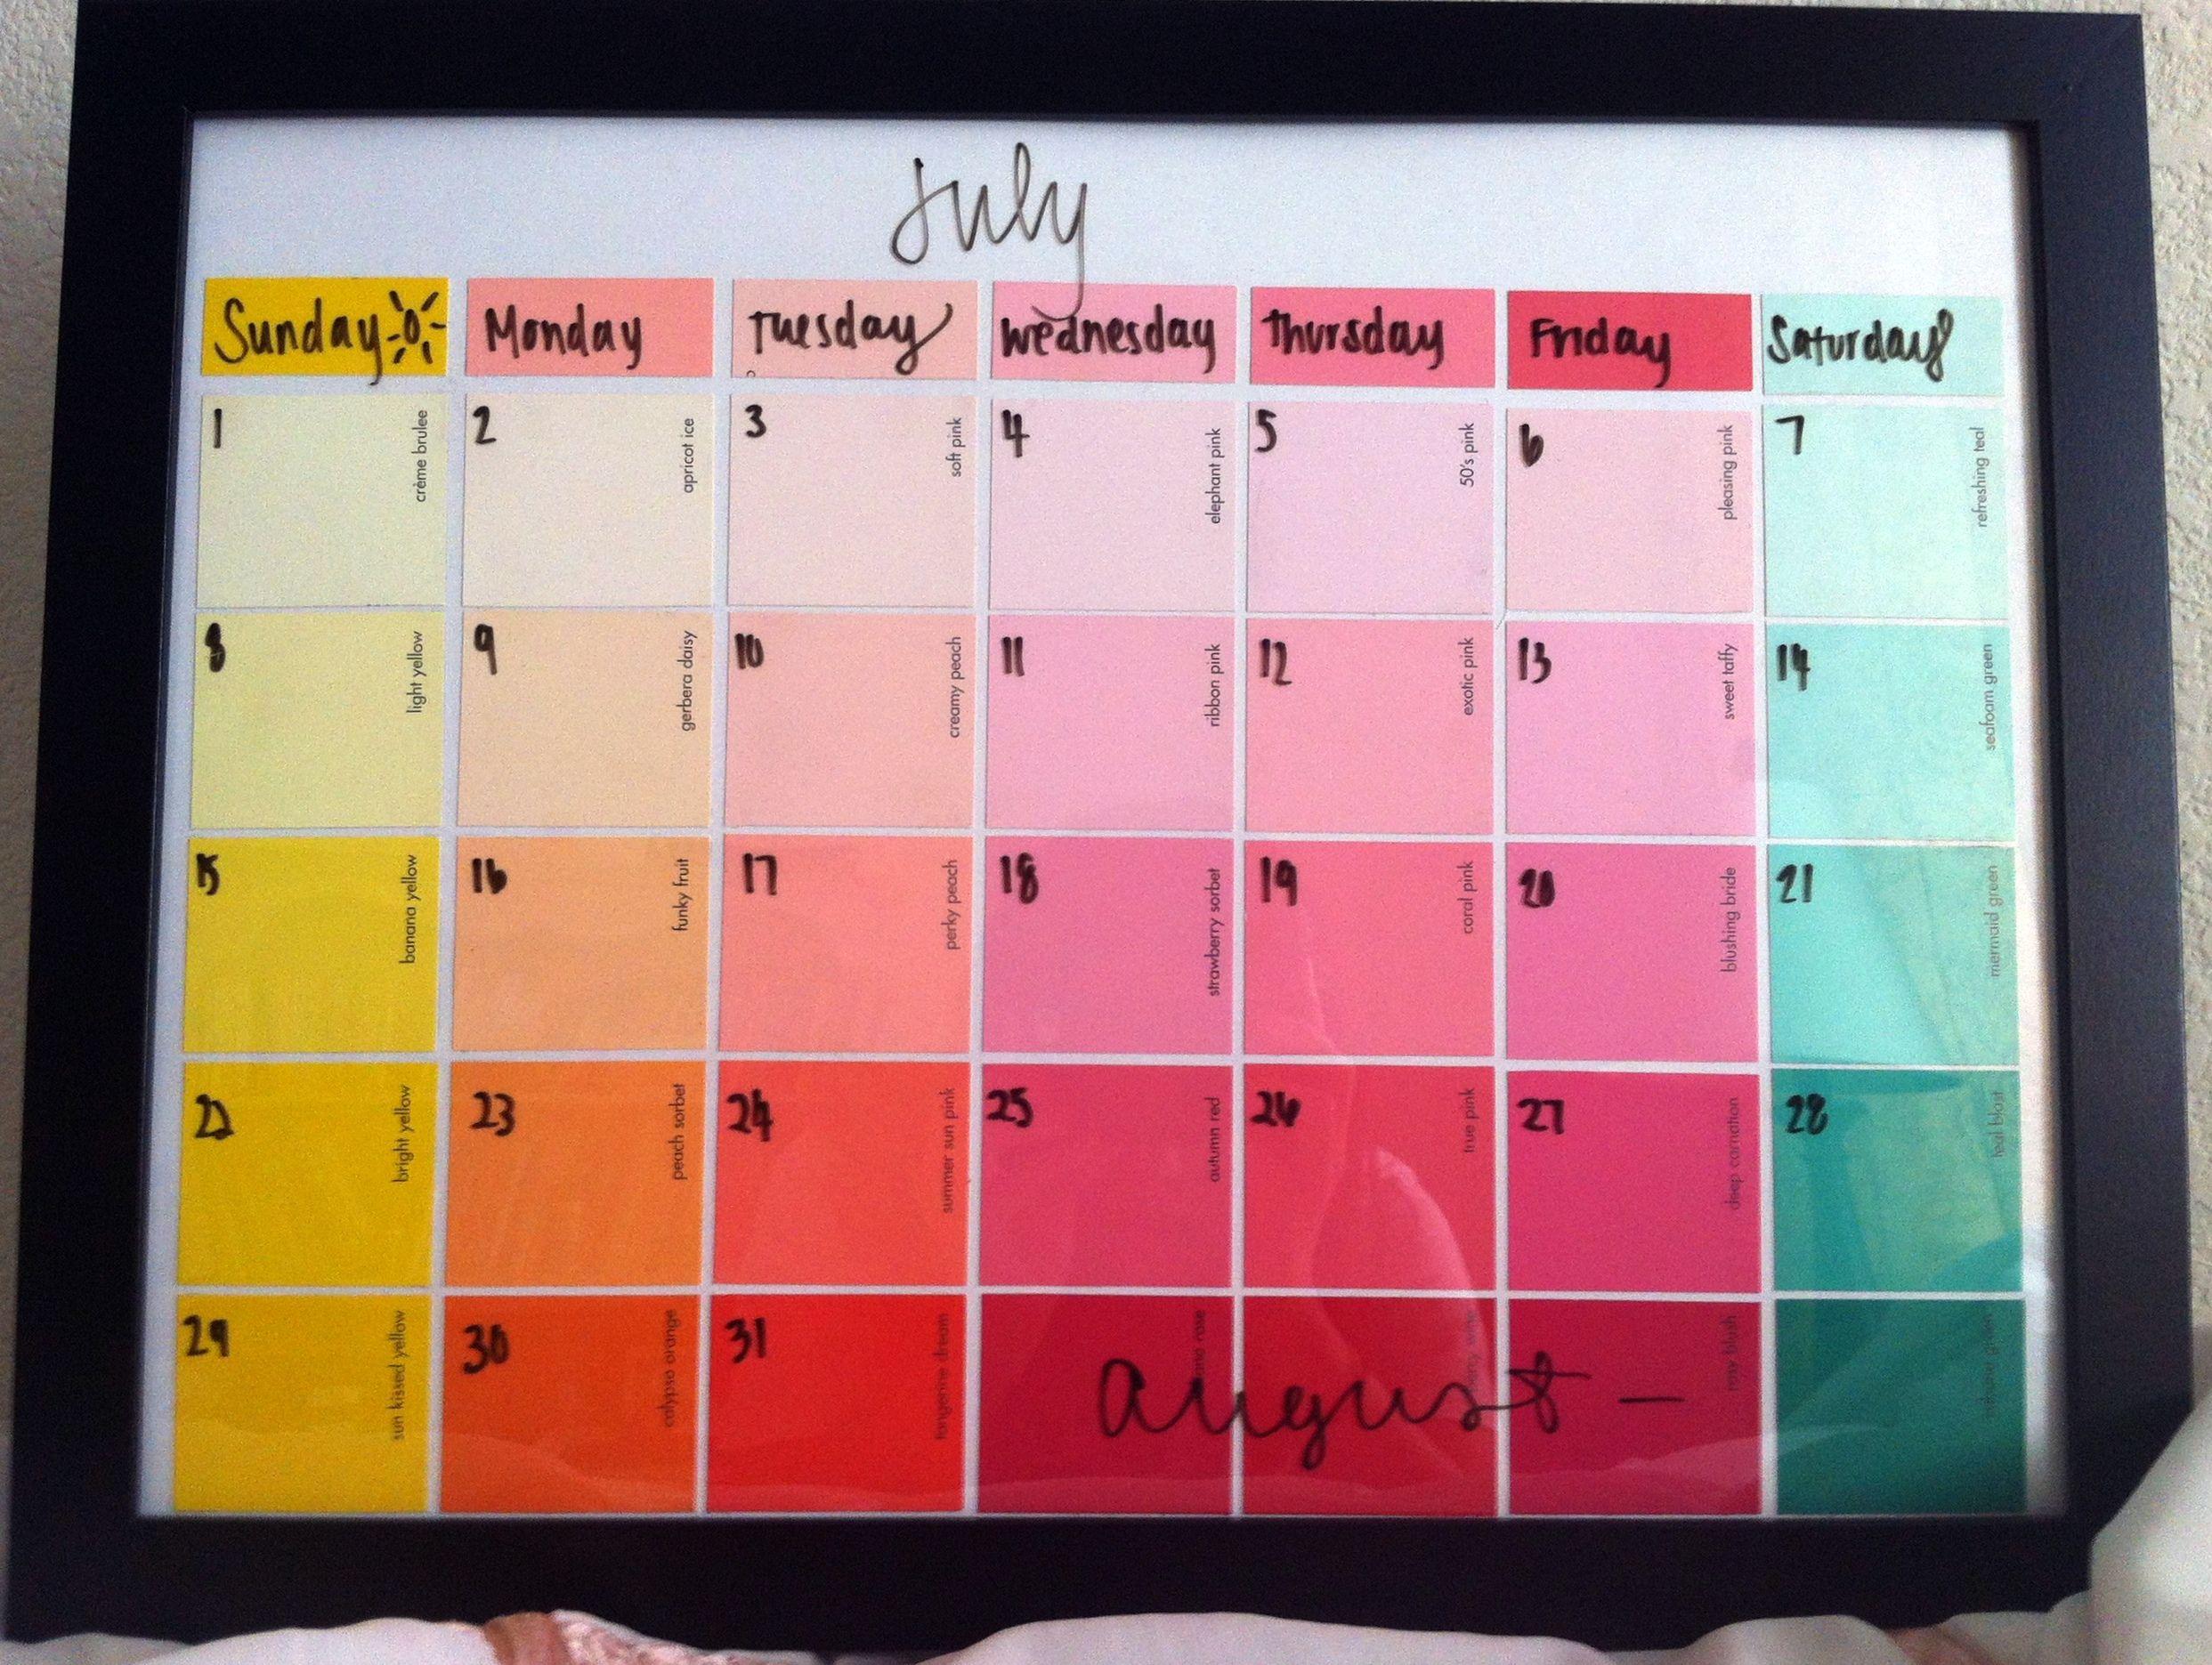 Paint sample calendar... Paint samples, glass, wet erase marker.  Great idea!